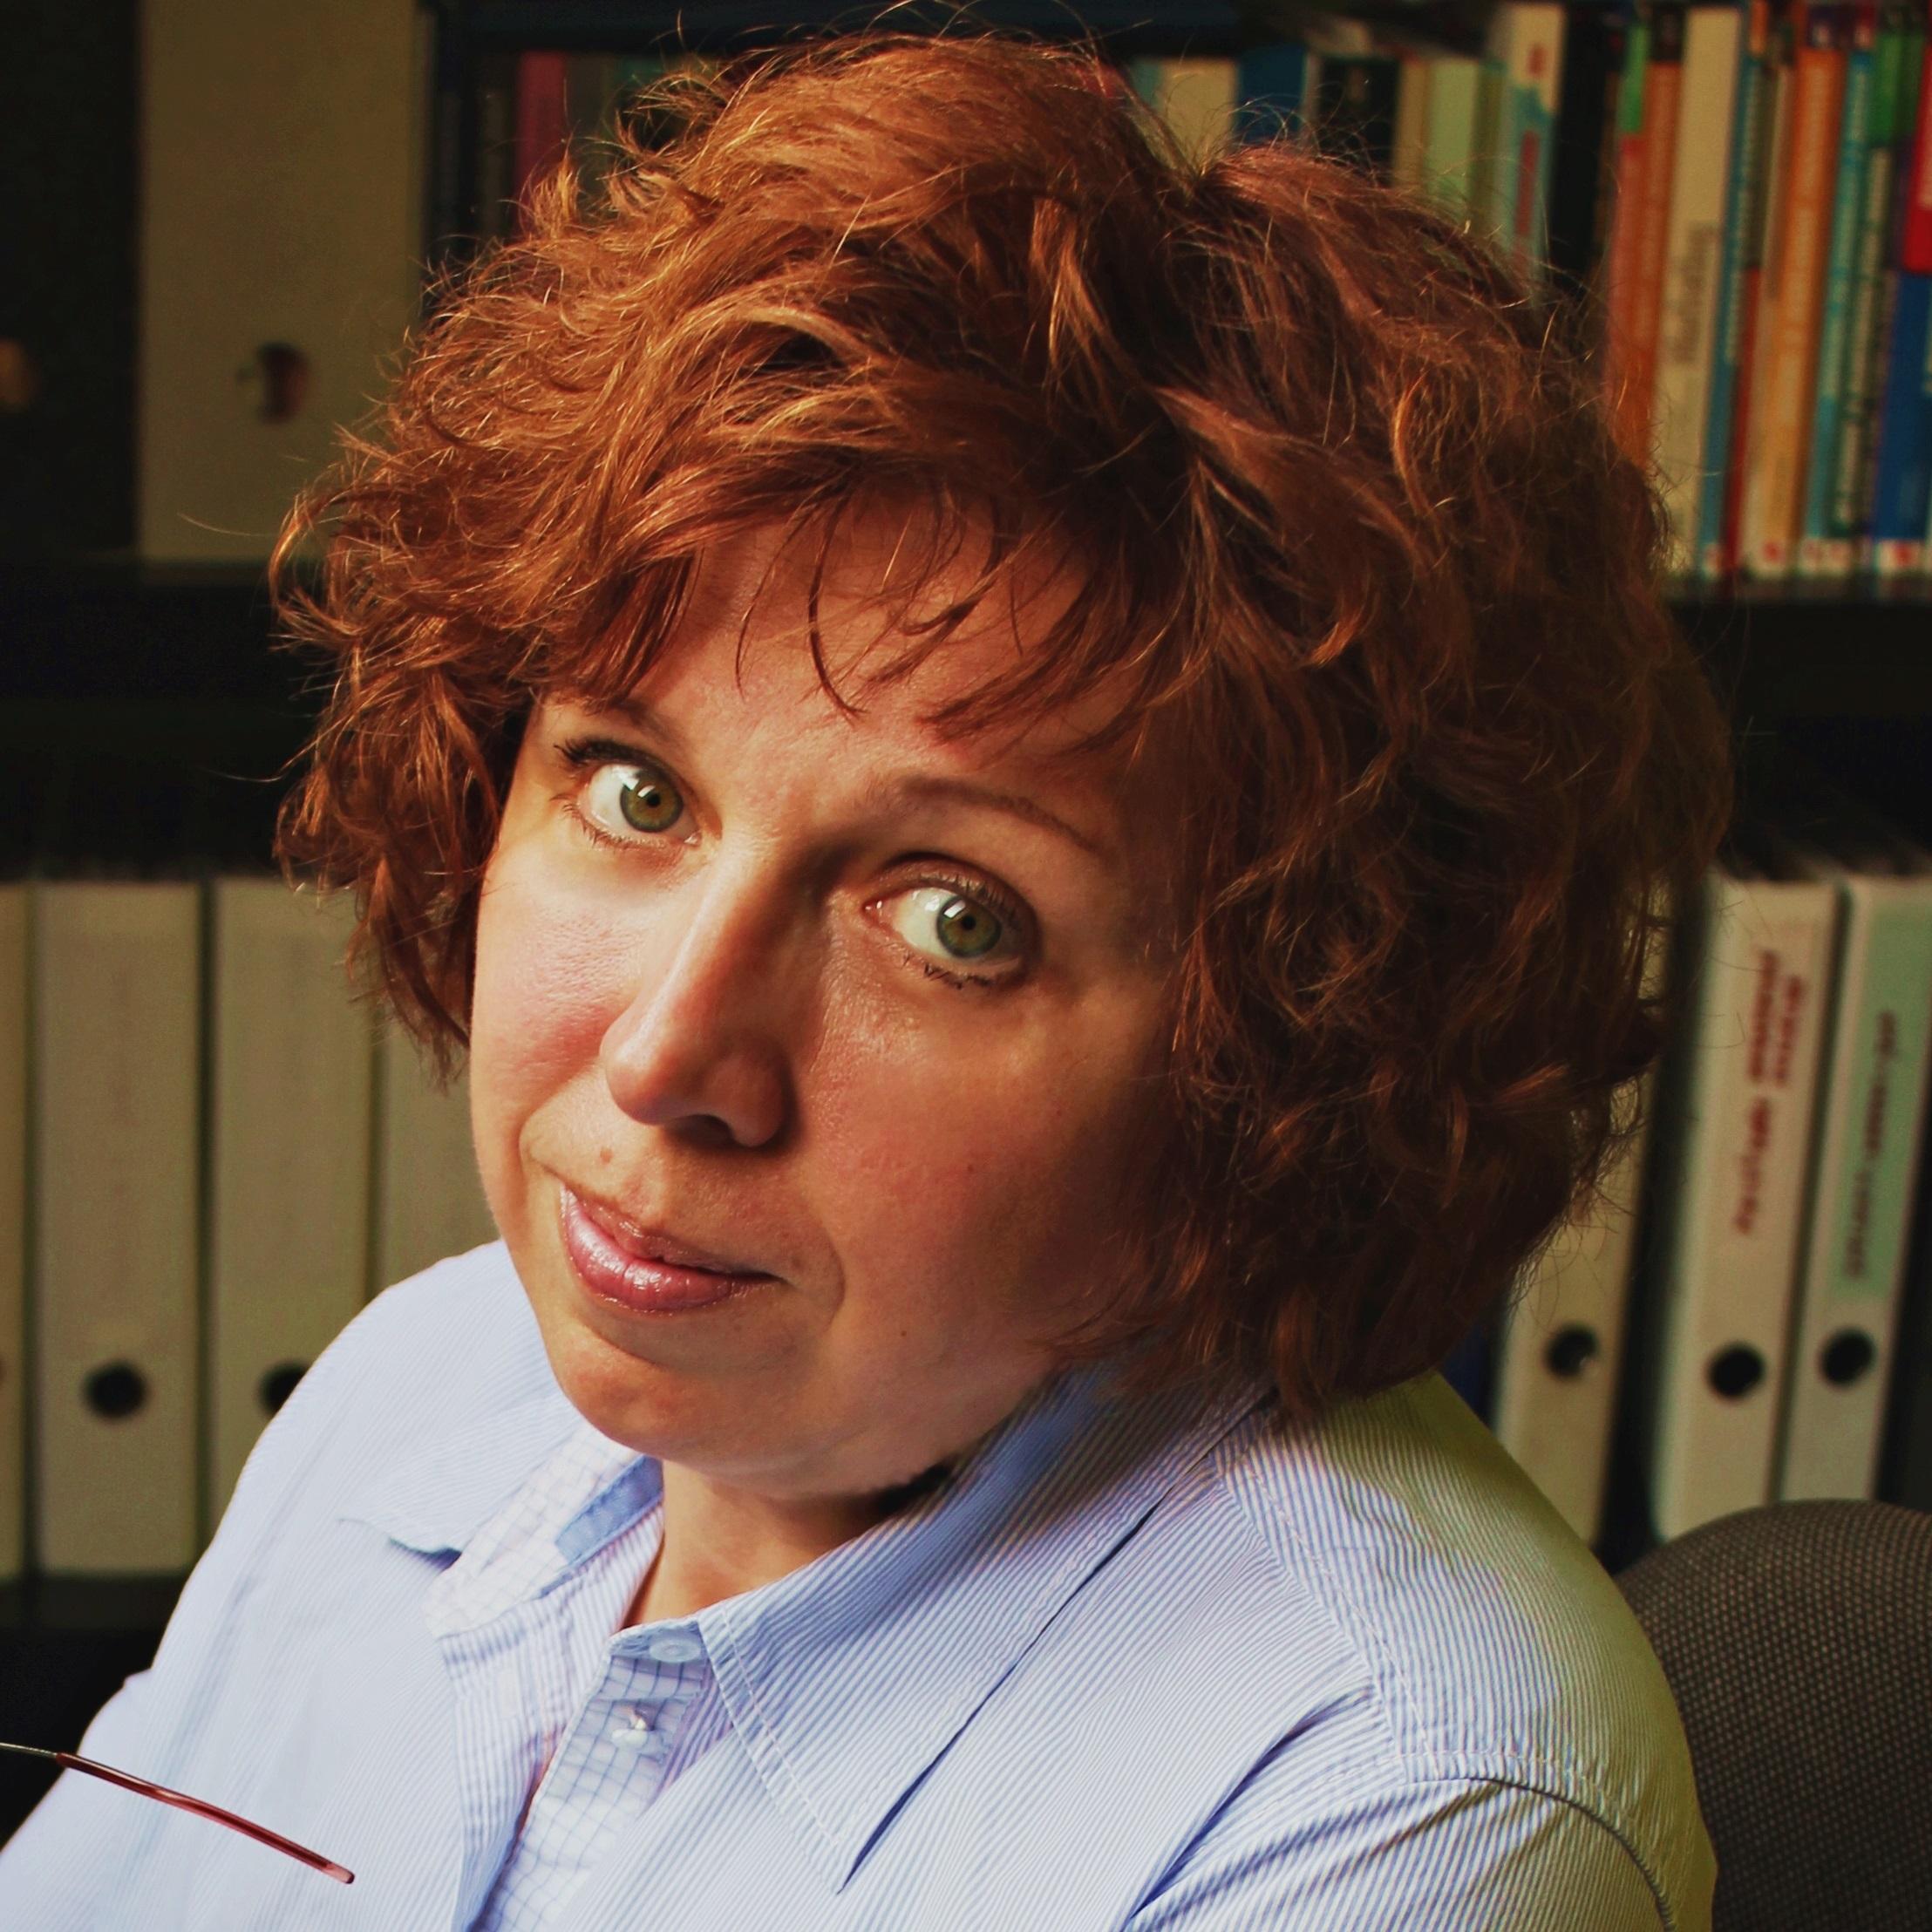 Katarína Ikrényiová